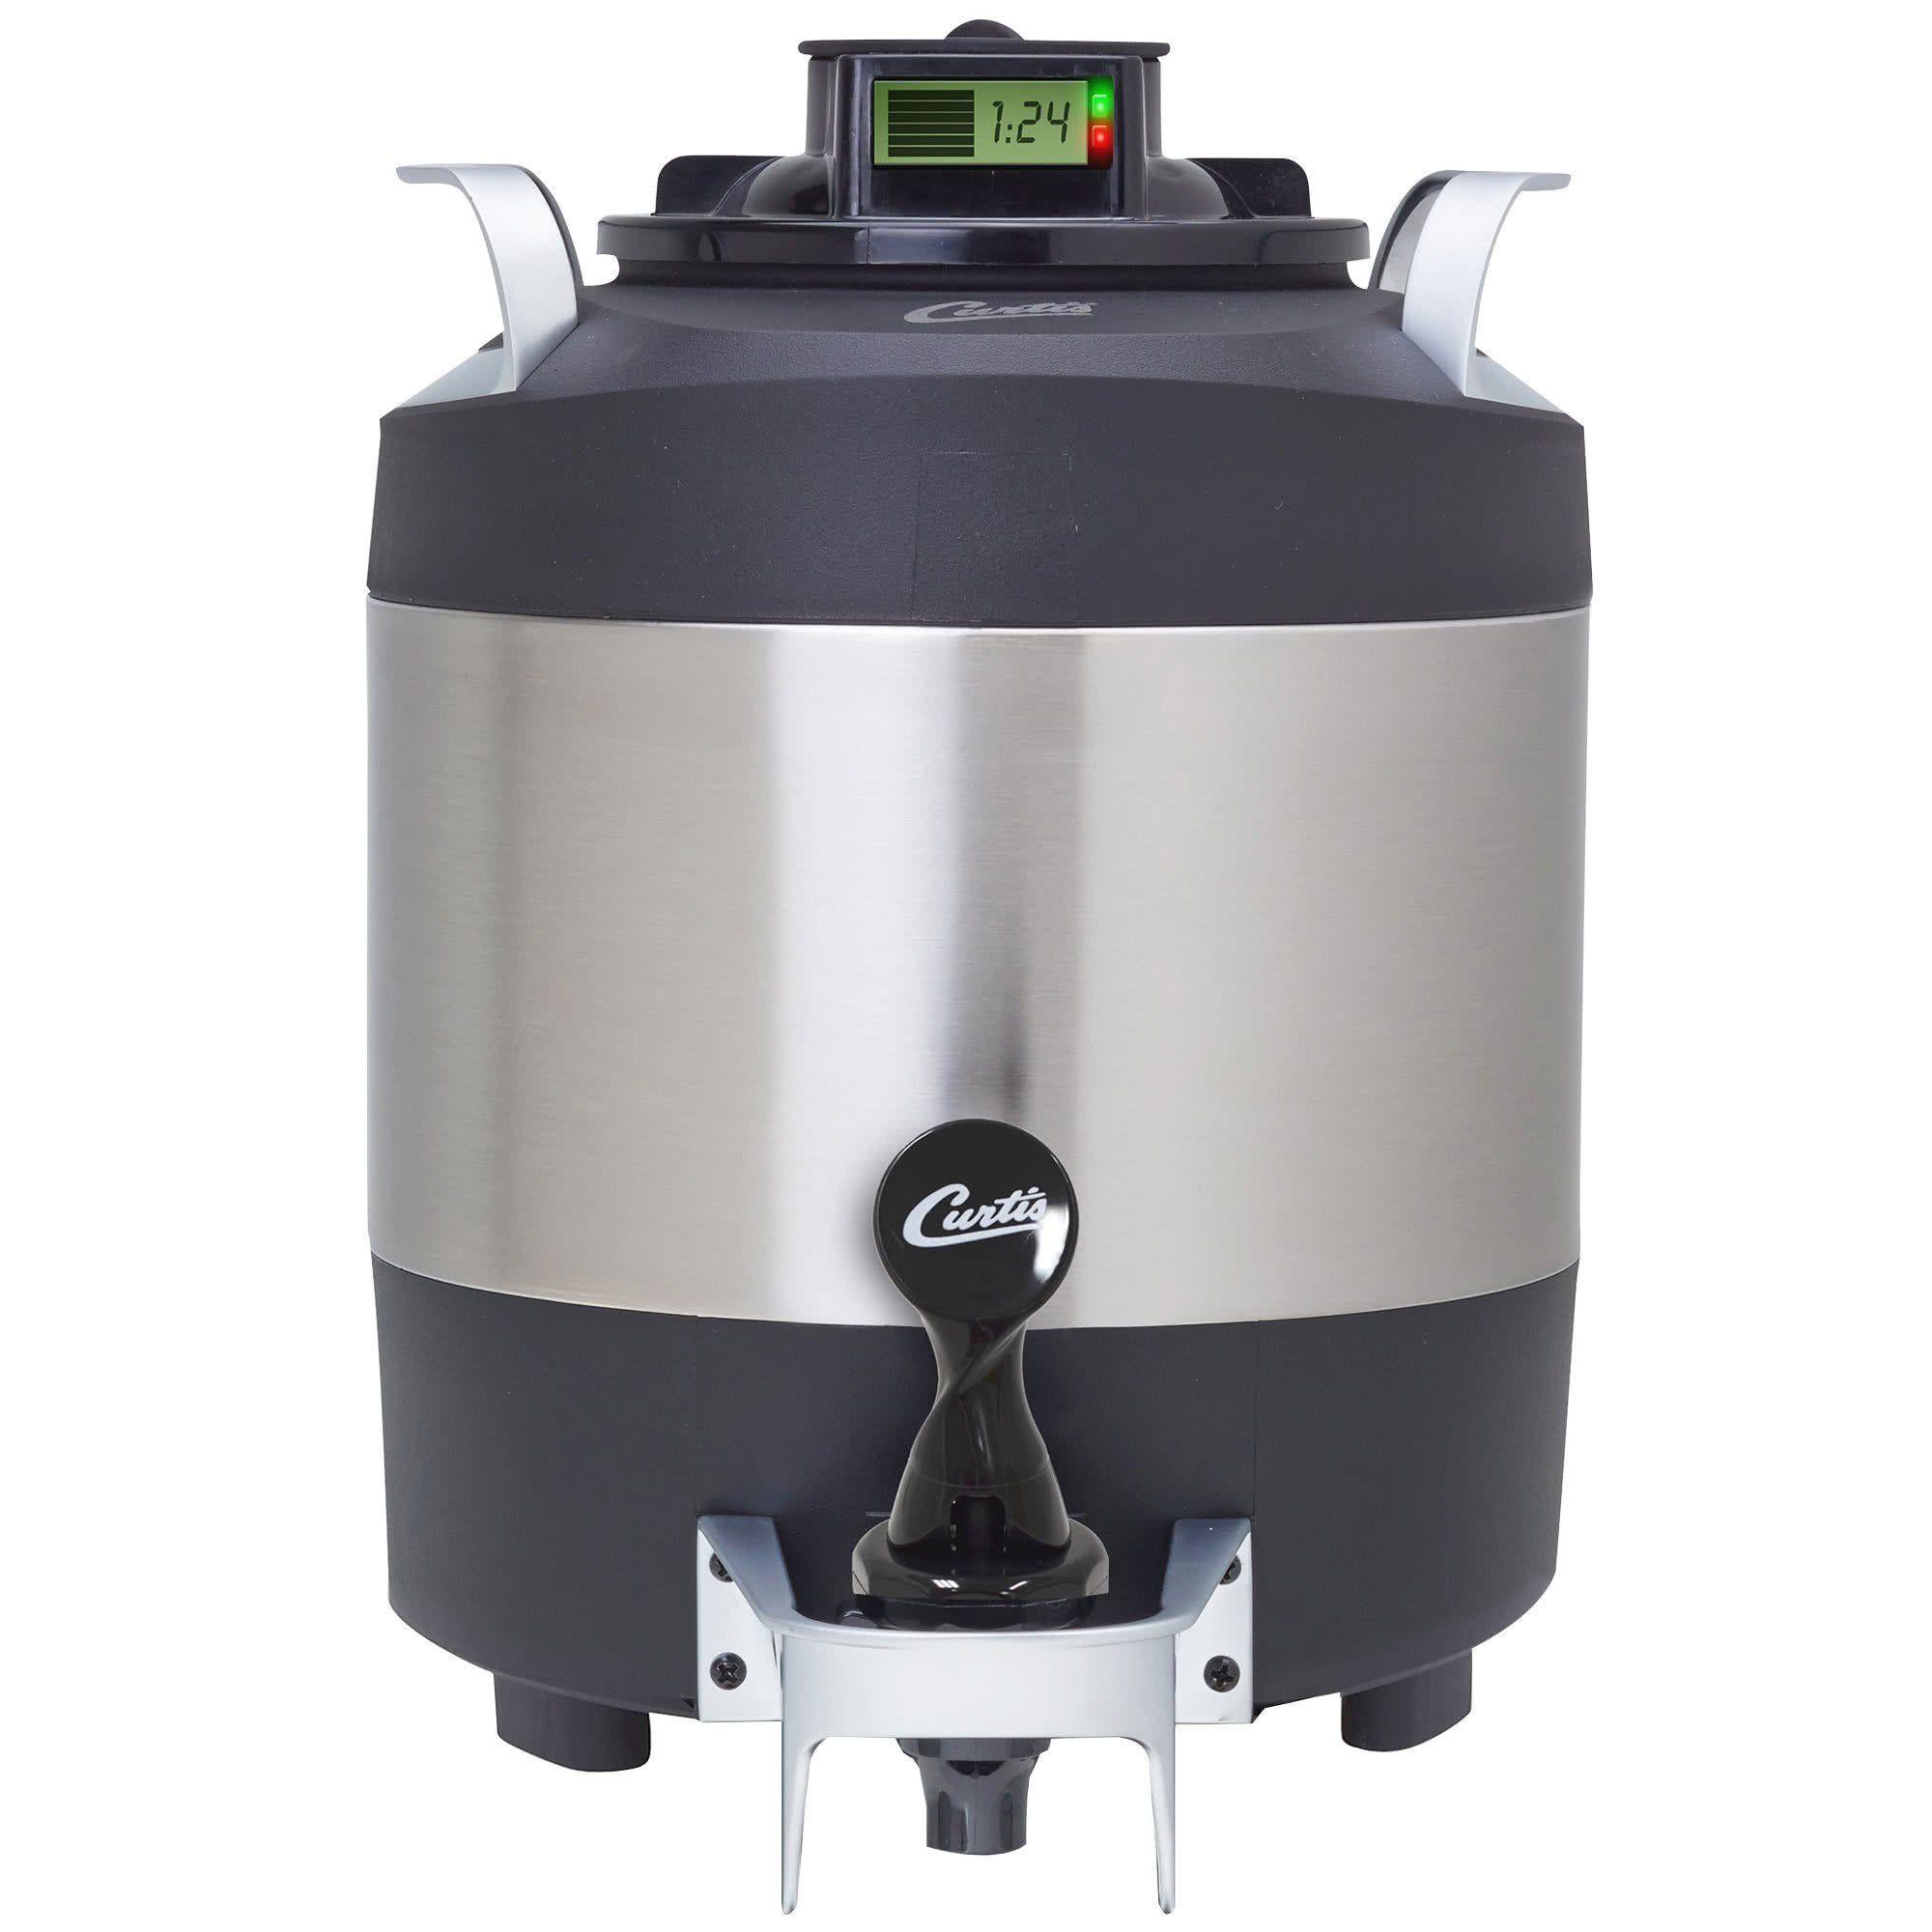 Wilbur Curtis TFT1G2 FreshTrac 1 Gallon Thermal Coffee Server, Brew ...